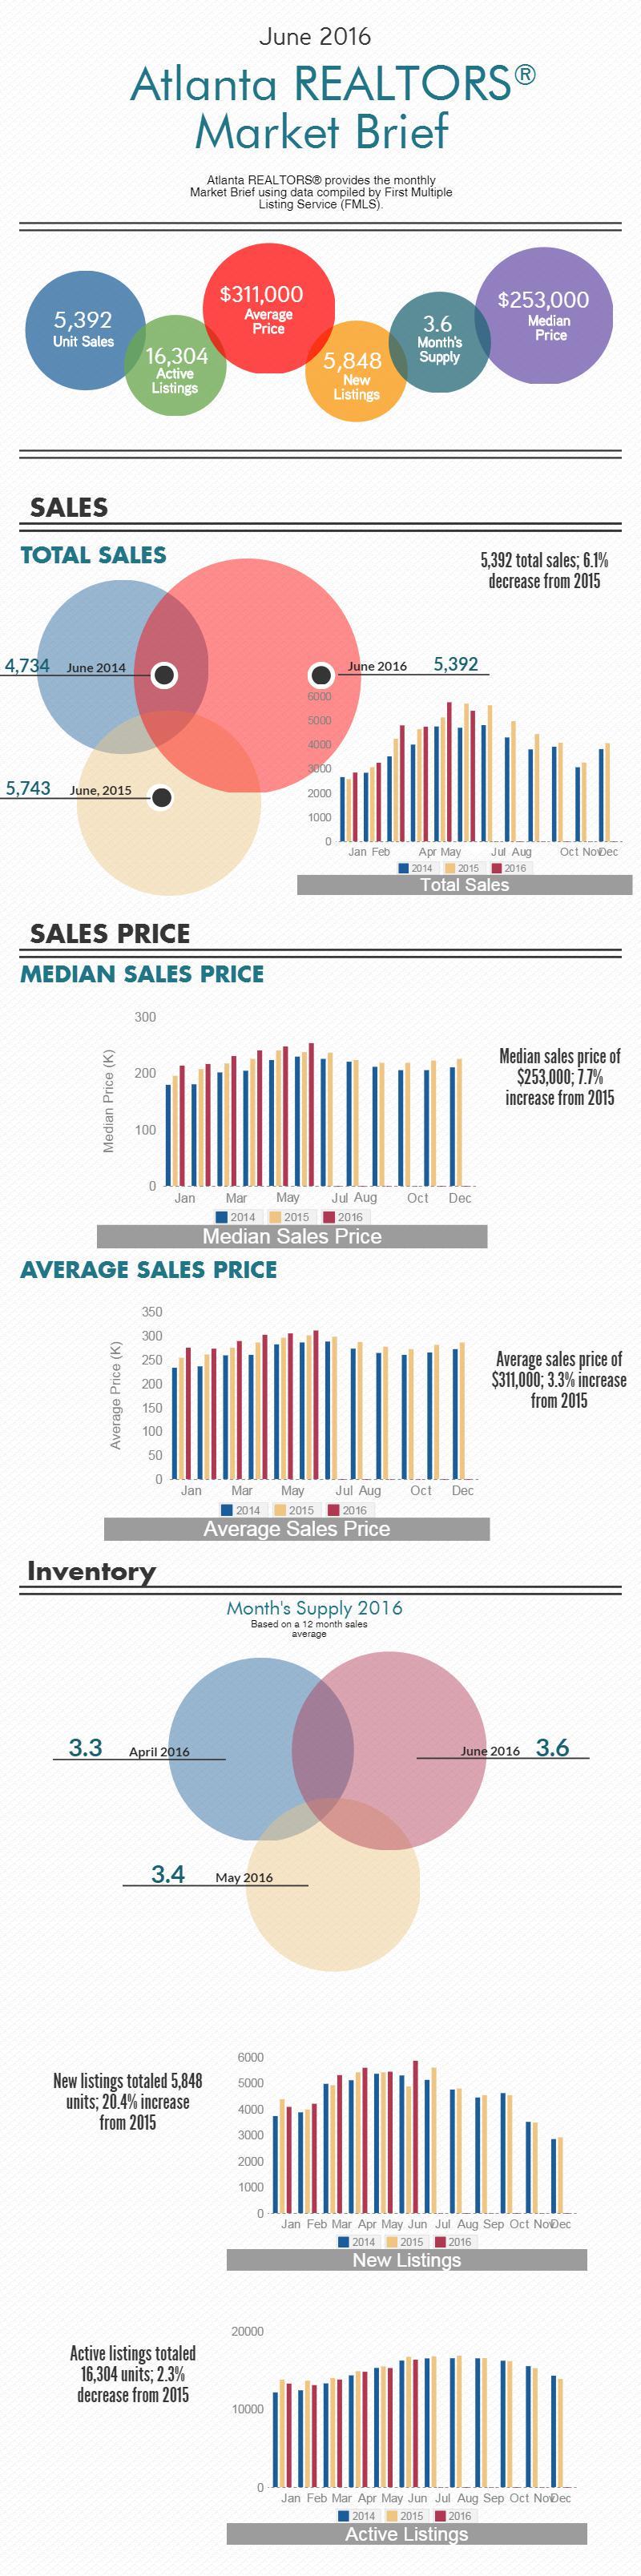 06_2016 market info